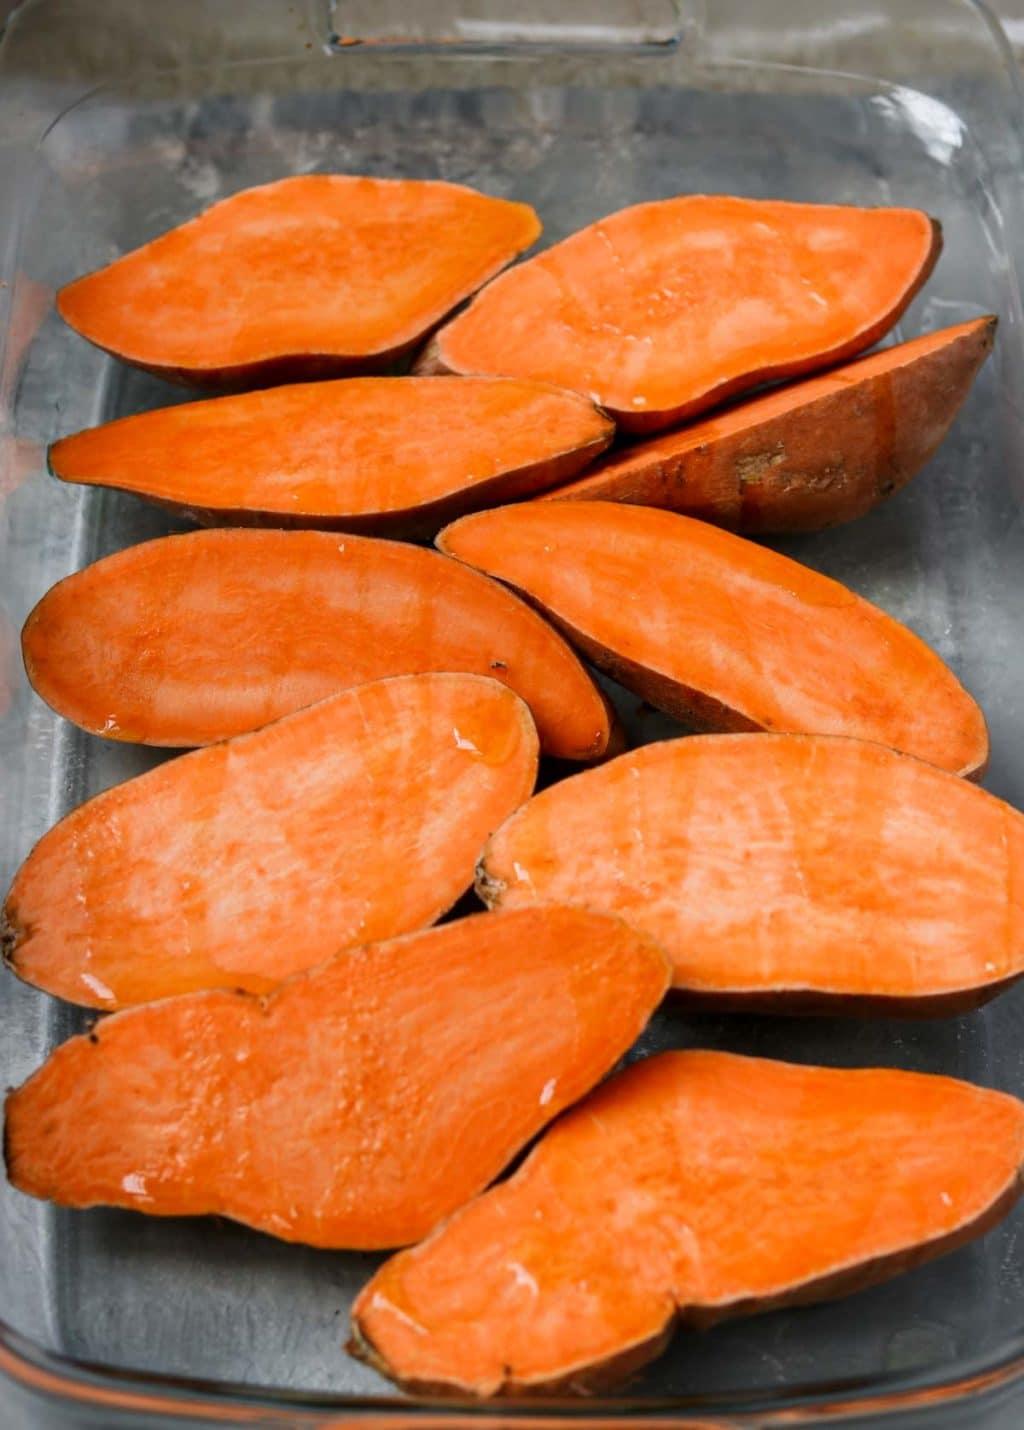 fresh cut sweet potatoes in a baking dish